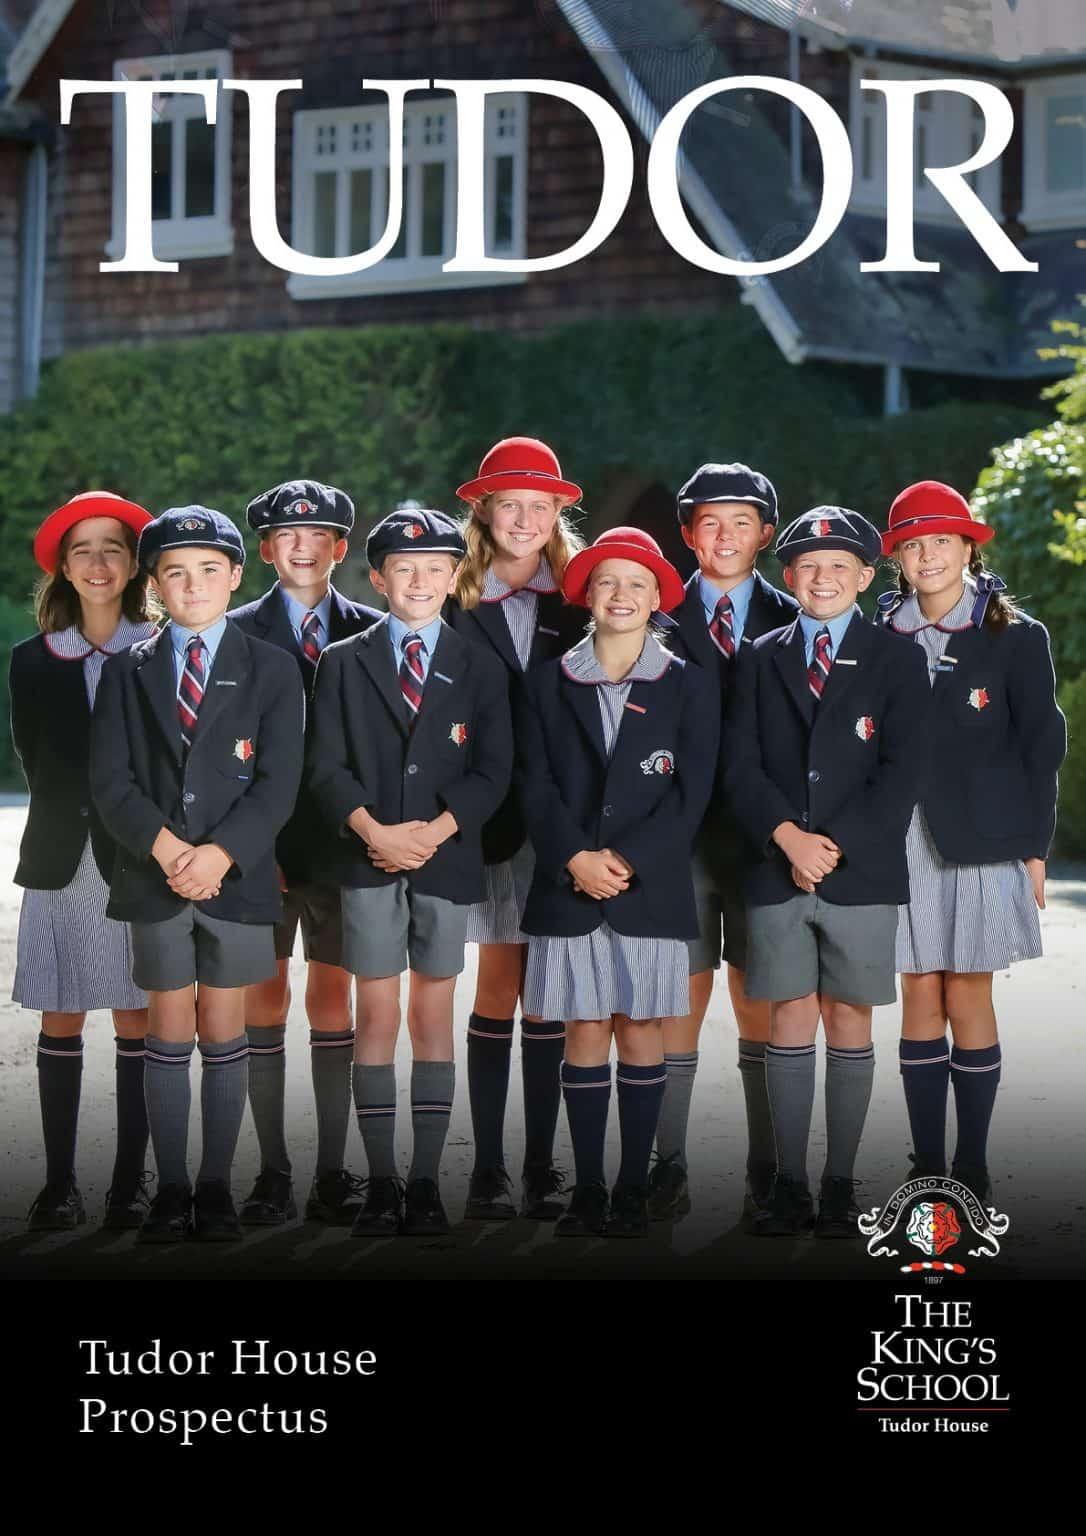 The King's School, The Tudor House School Prospectus